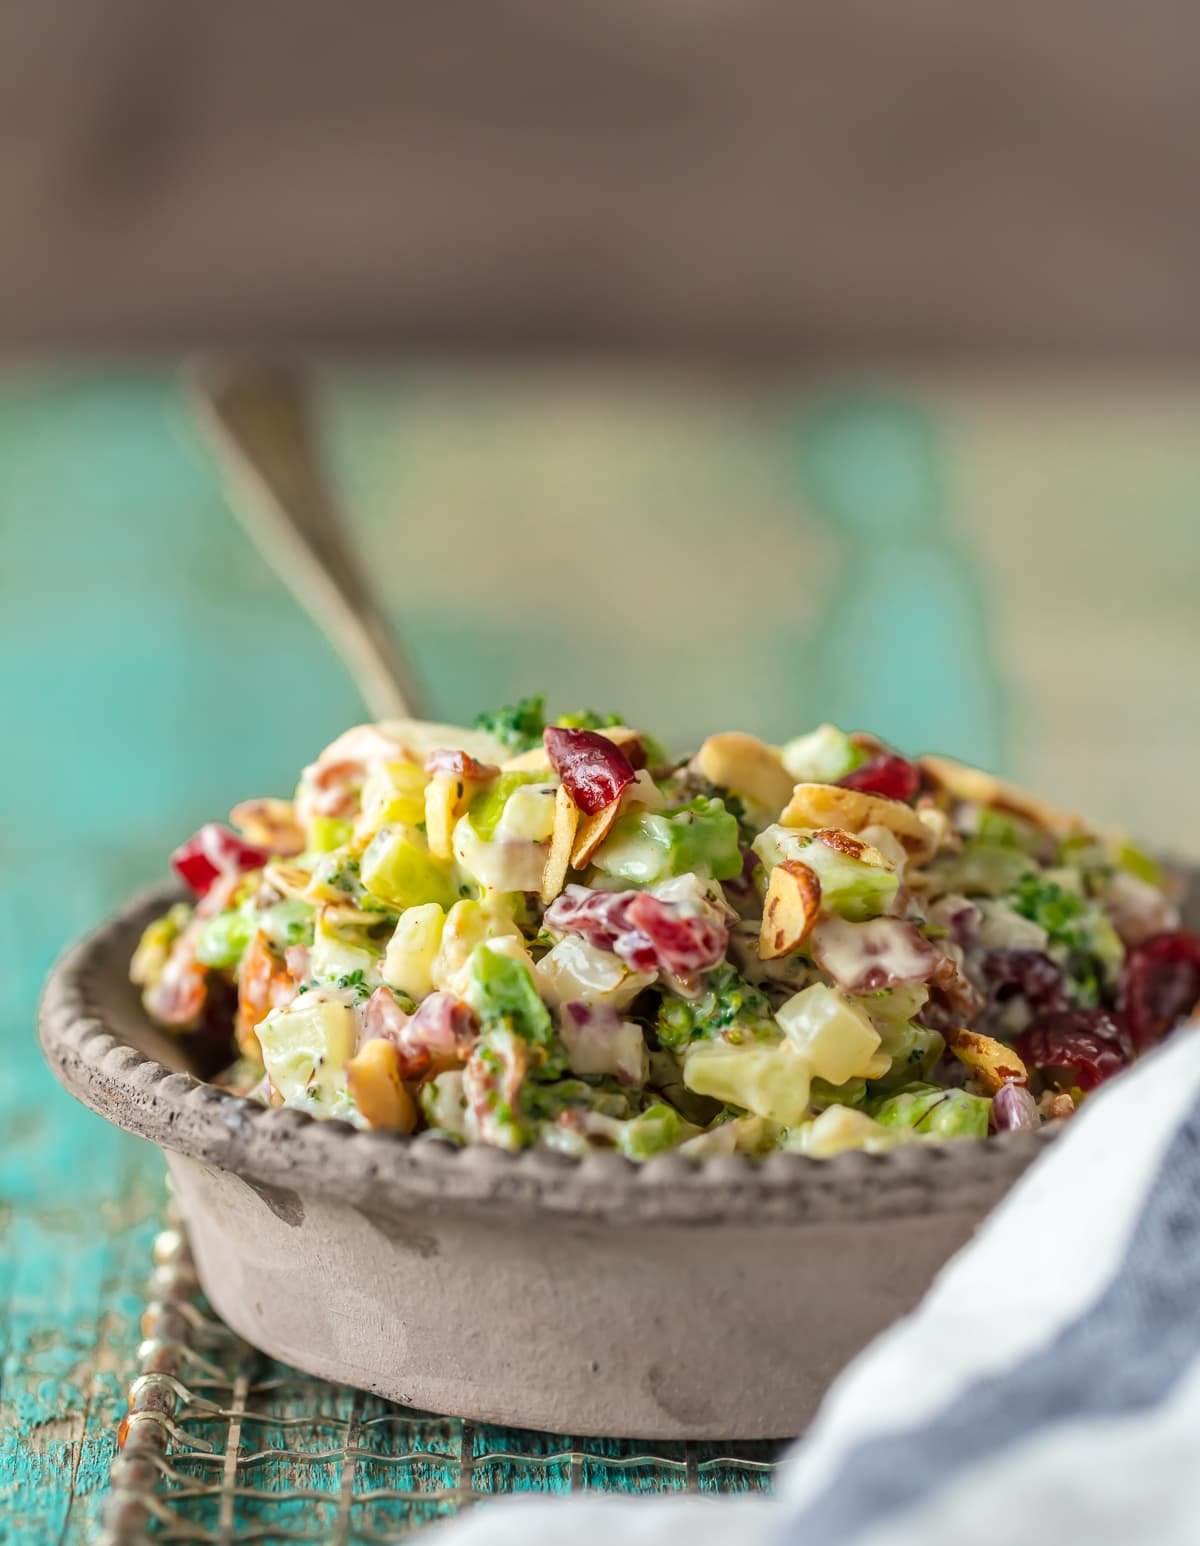 Cranberry Almond Broccoli Salad recipe in a bowl